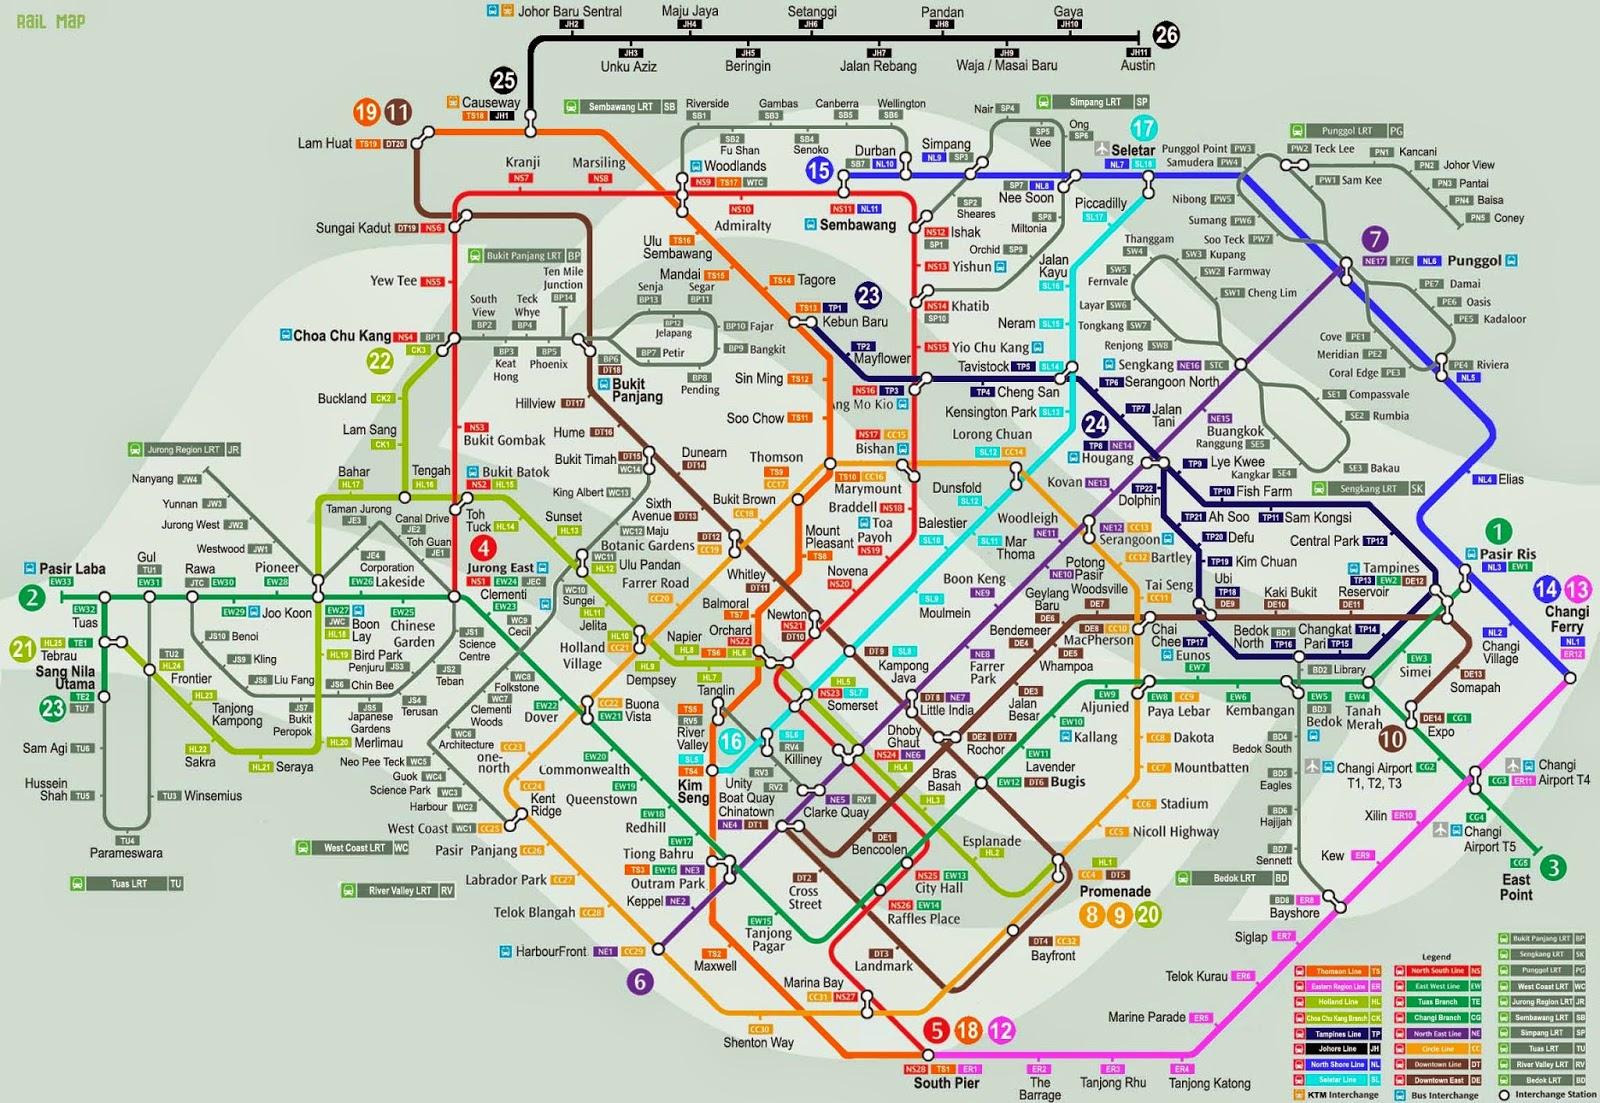 MRT Singapore Maps 2015 & Future Line